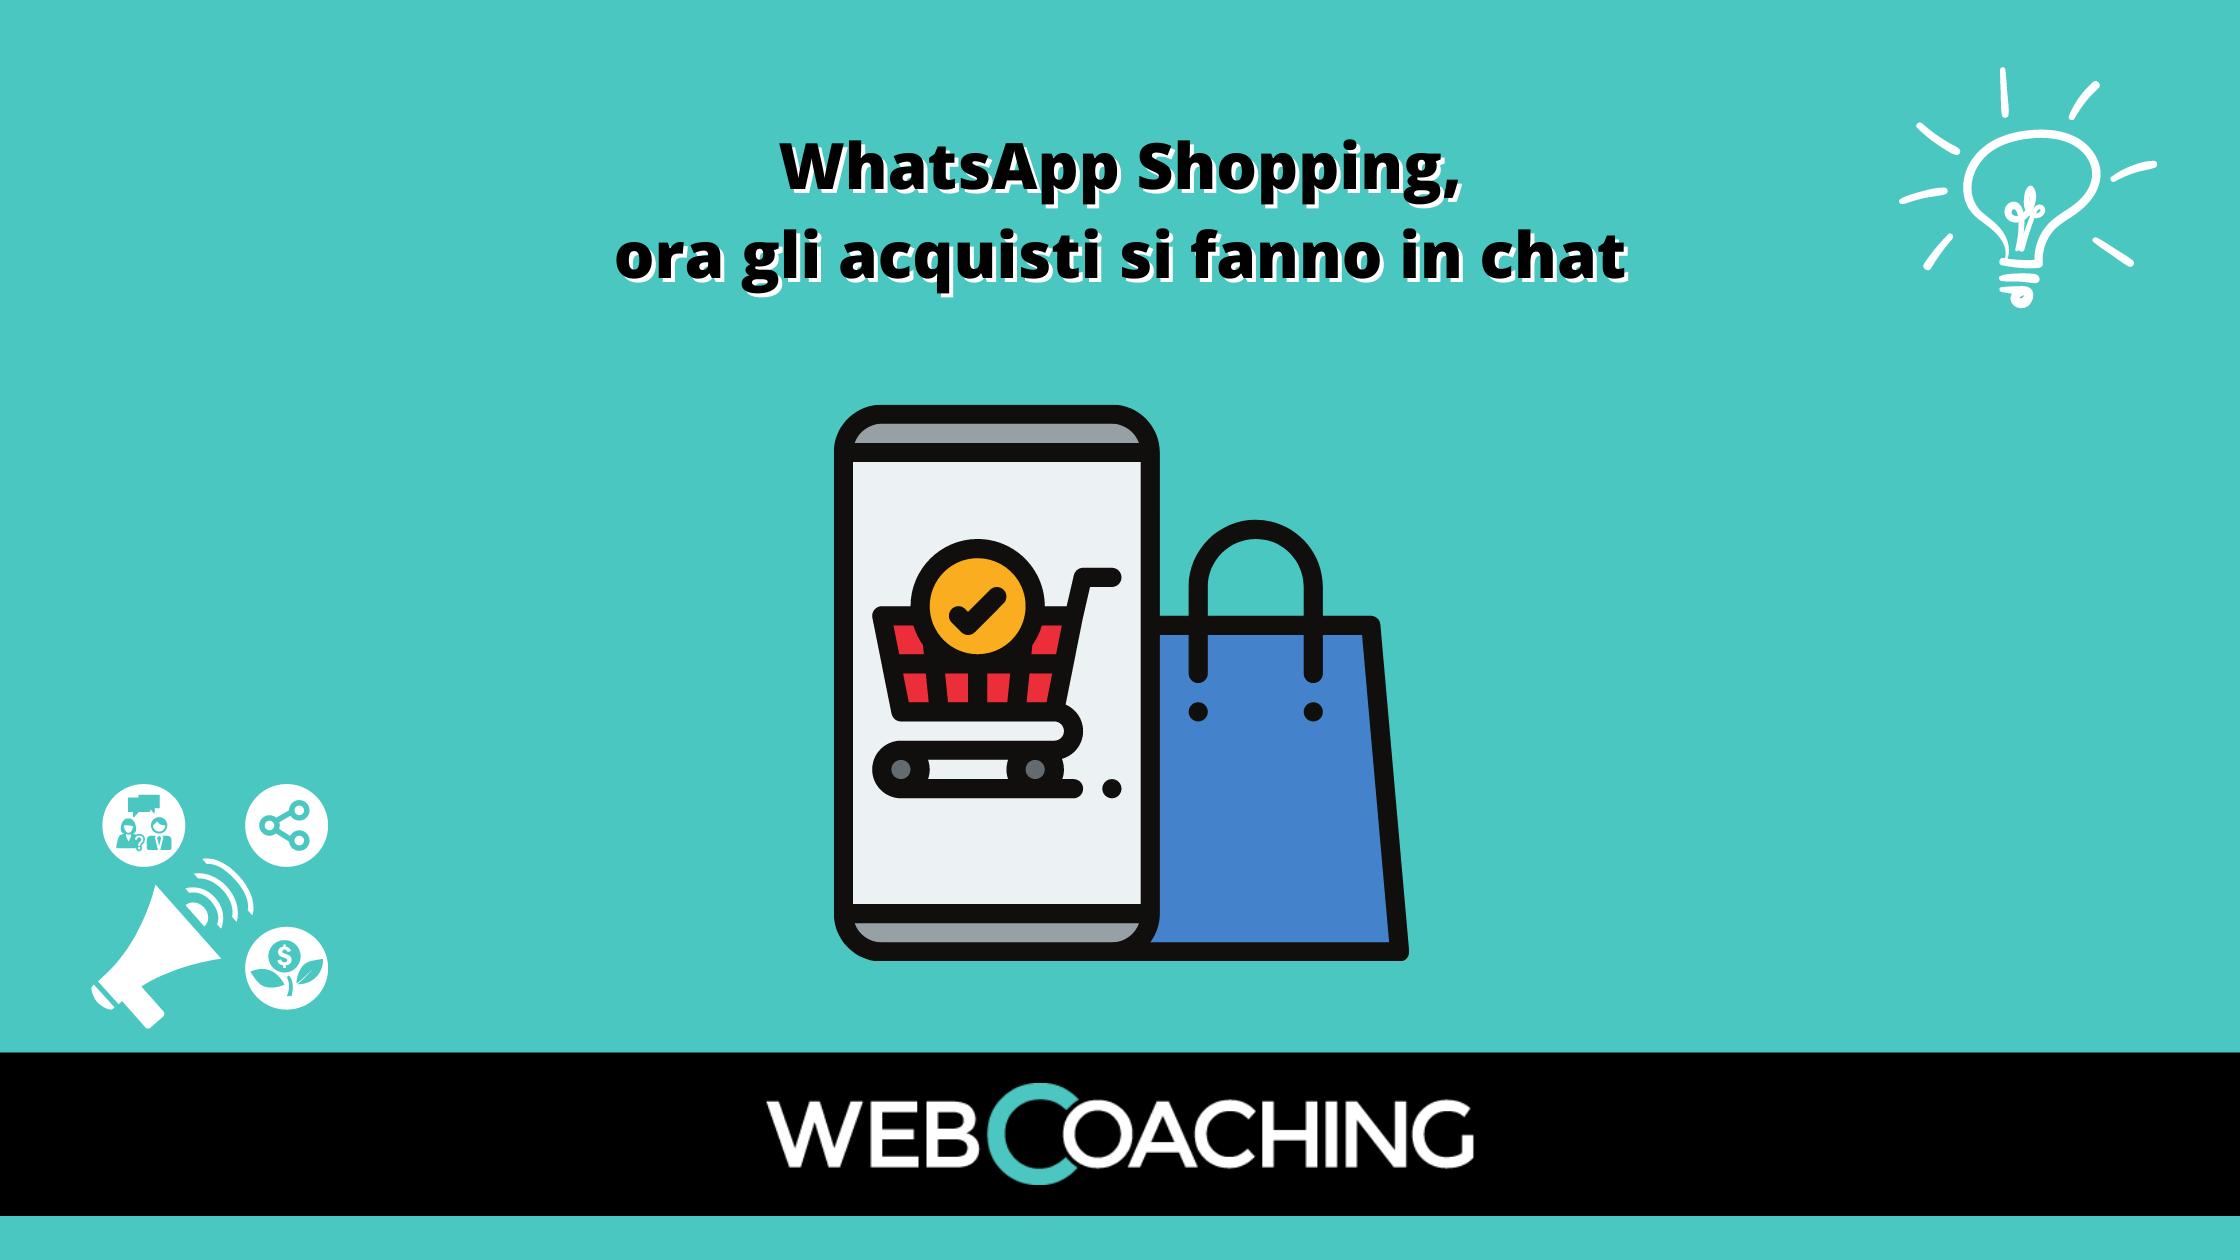 Whatsapp Shopping